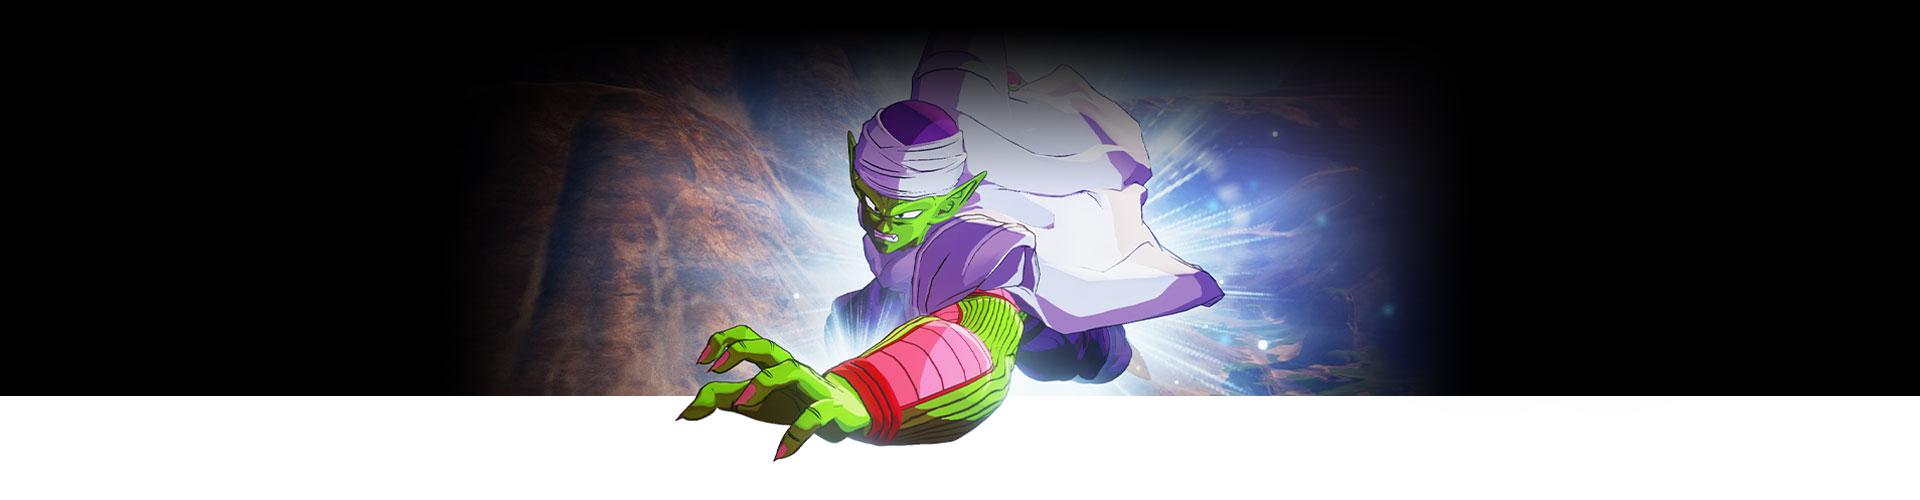 Piccolo vole vers l'avant avec sa main tendue.